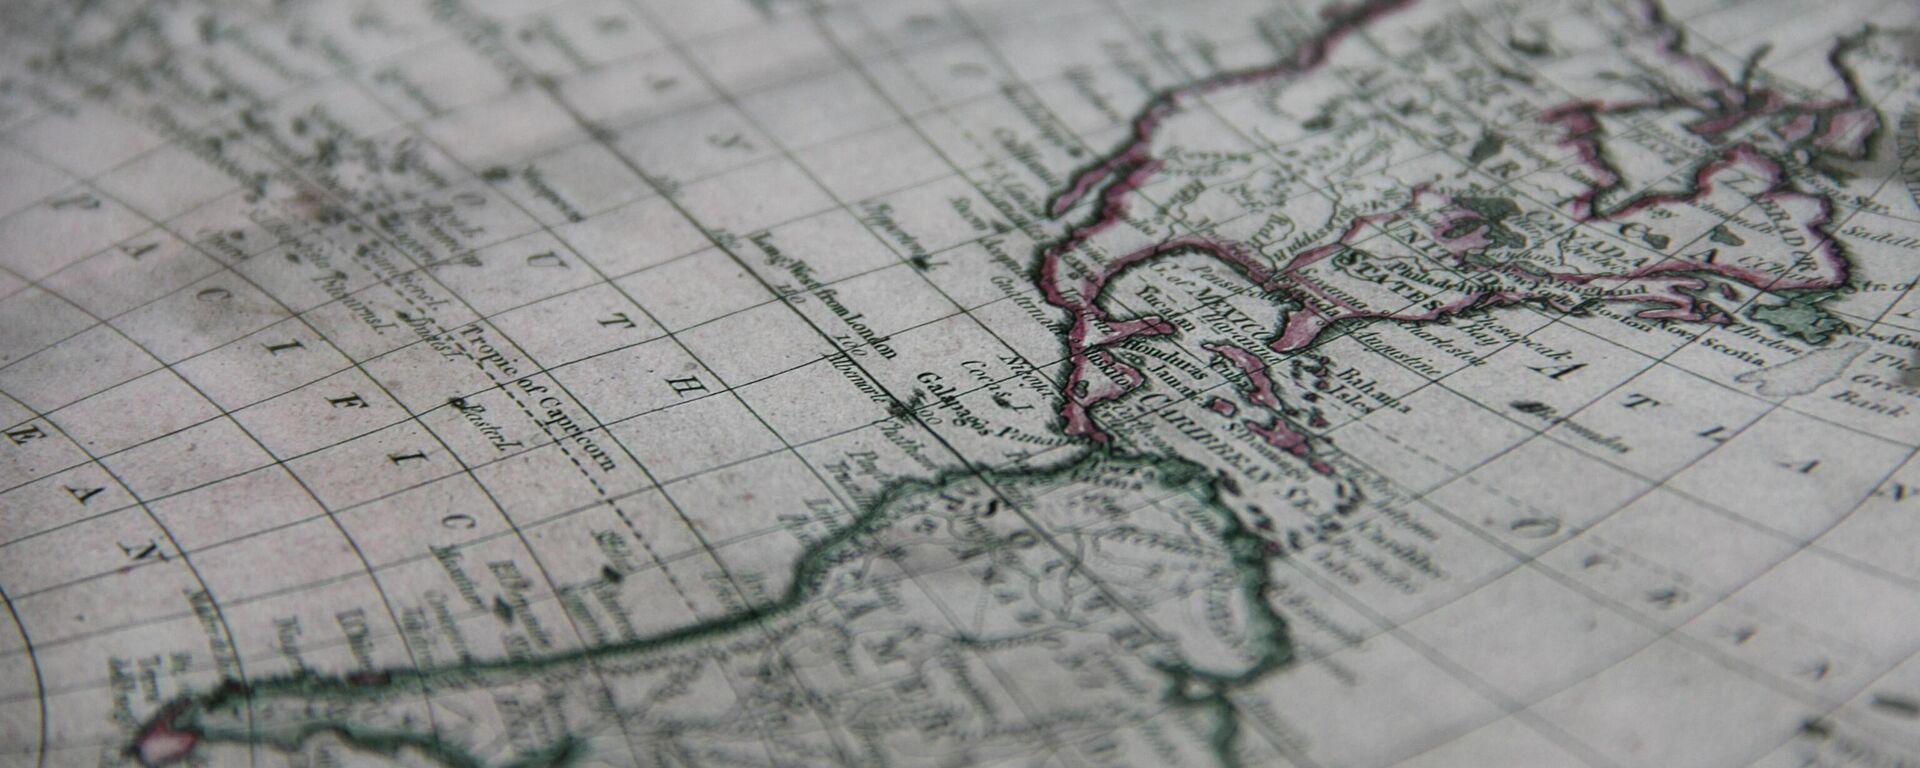 El mapa de América Latina - Sputnik Mundo, 1920, 06.10.2021